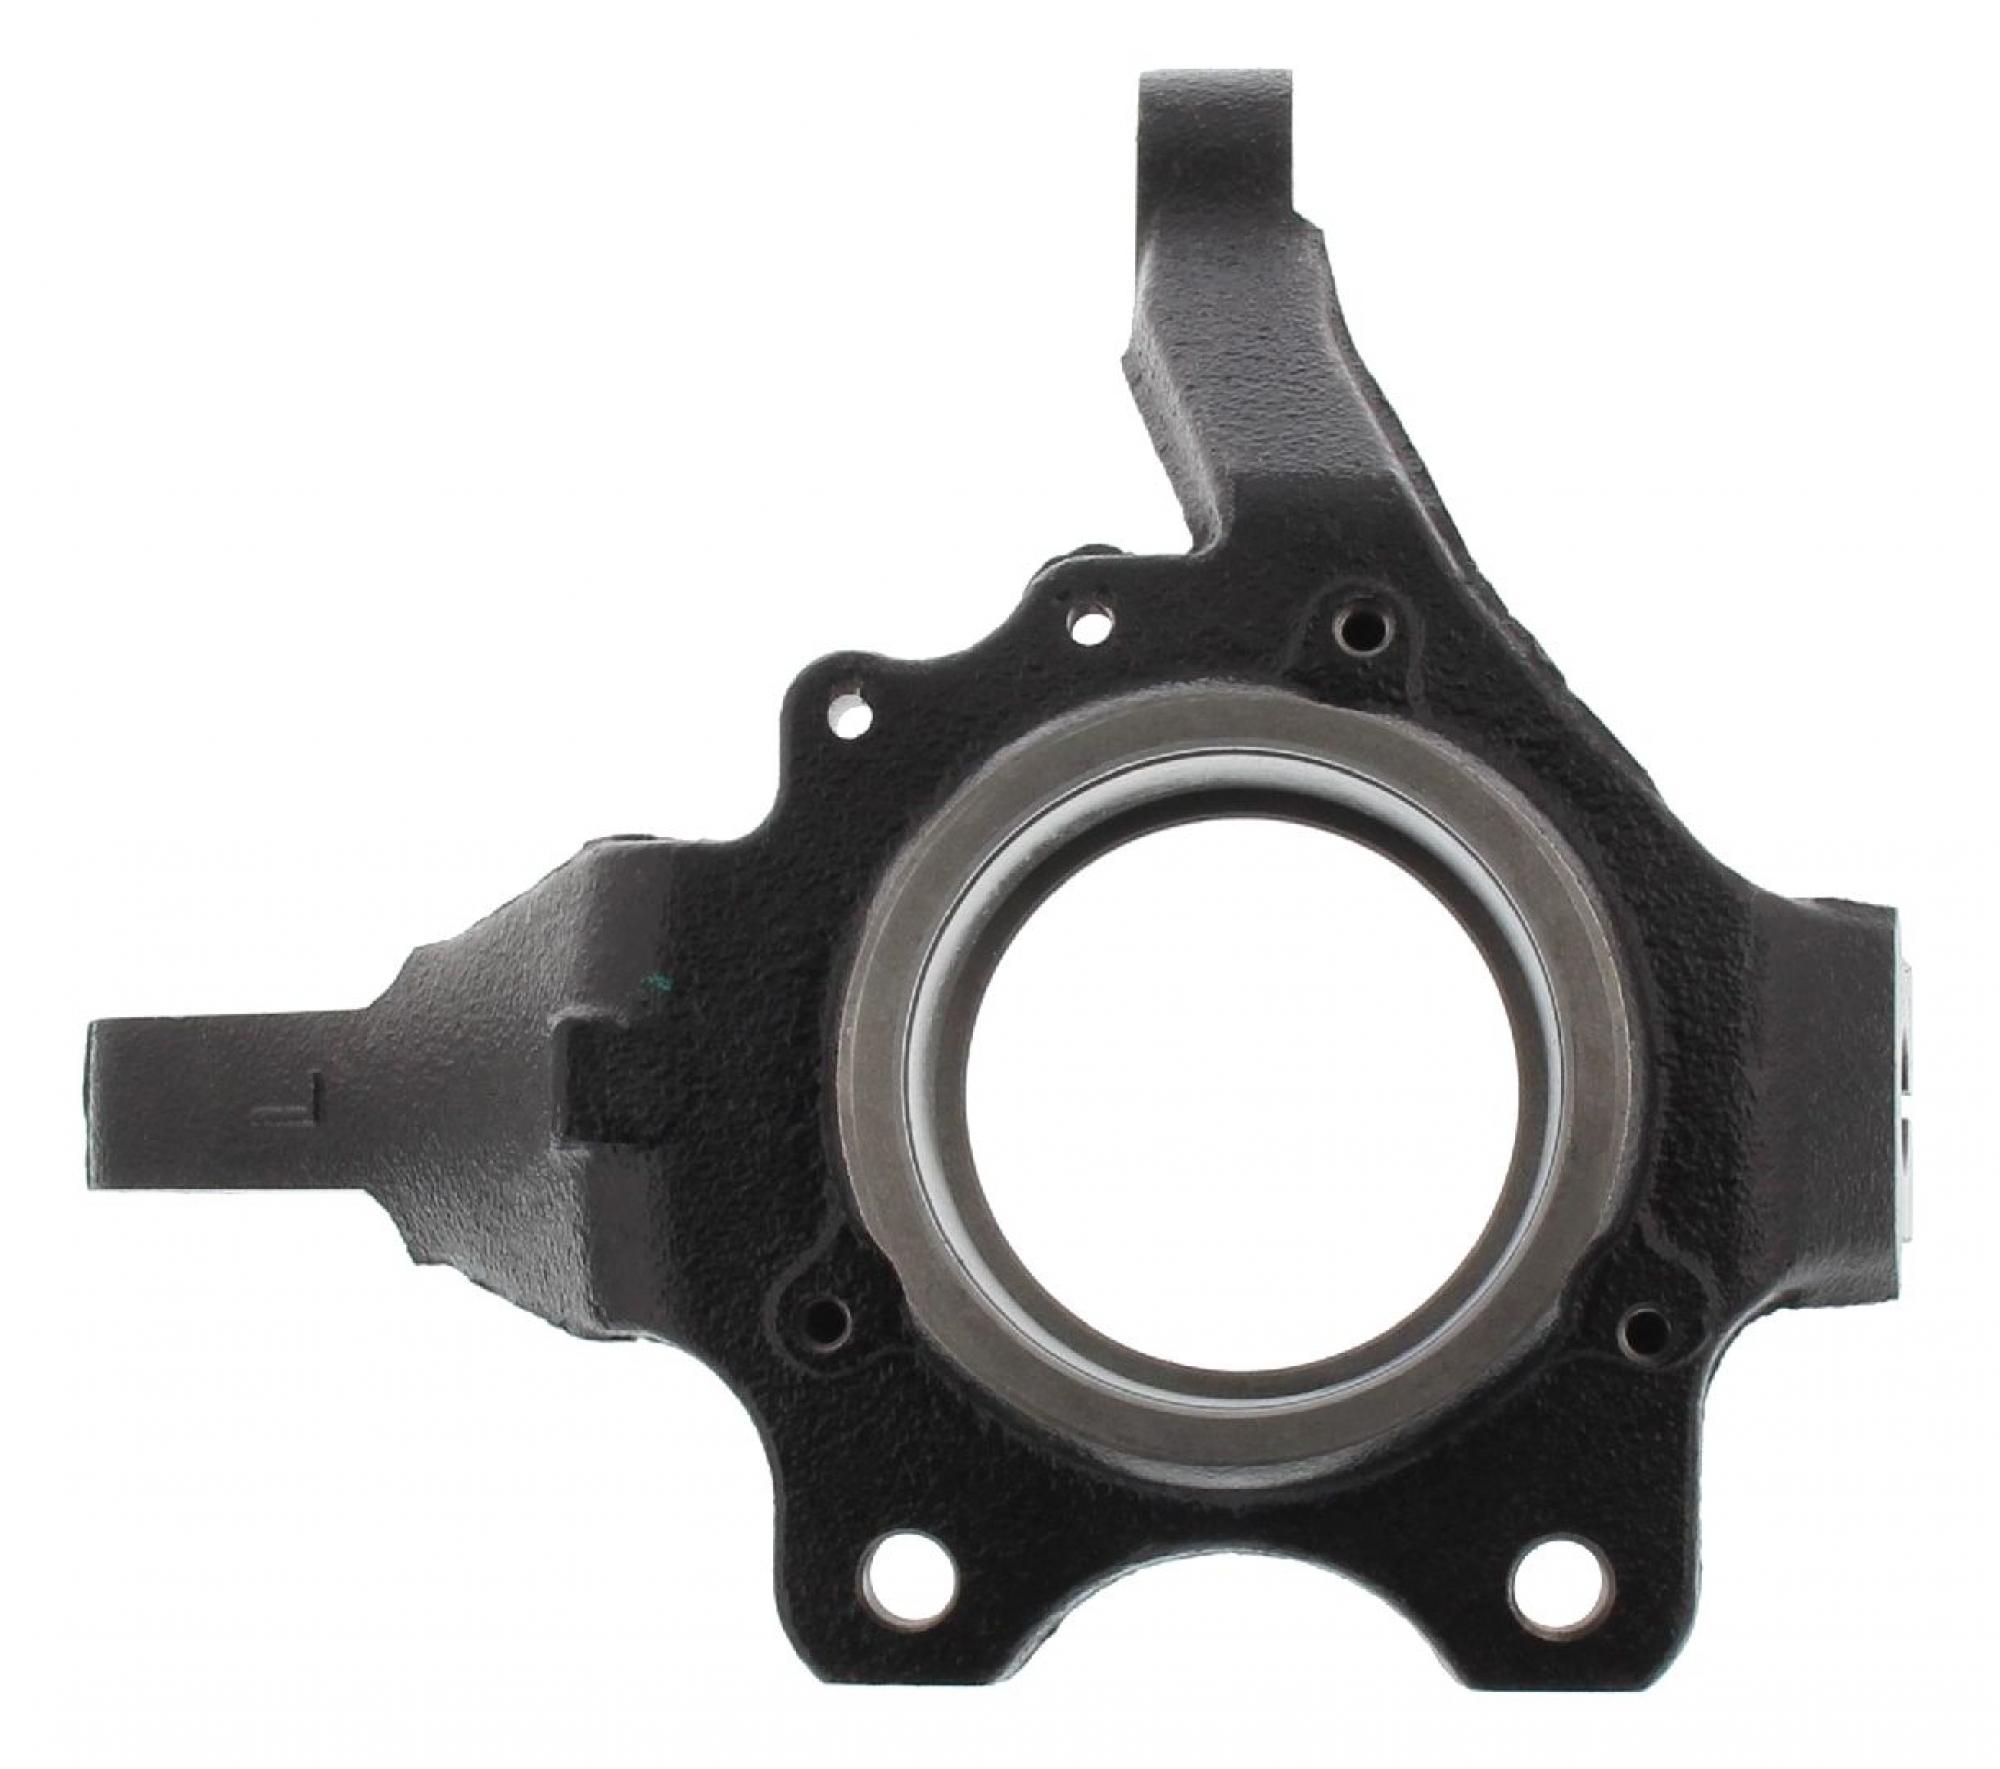 MAPCO 107702 Stub Axle, wheel suspension